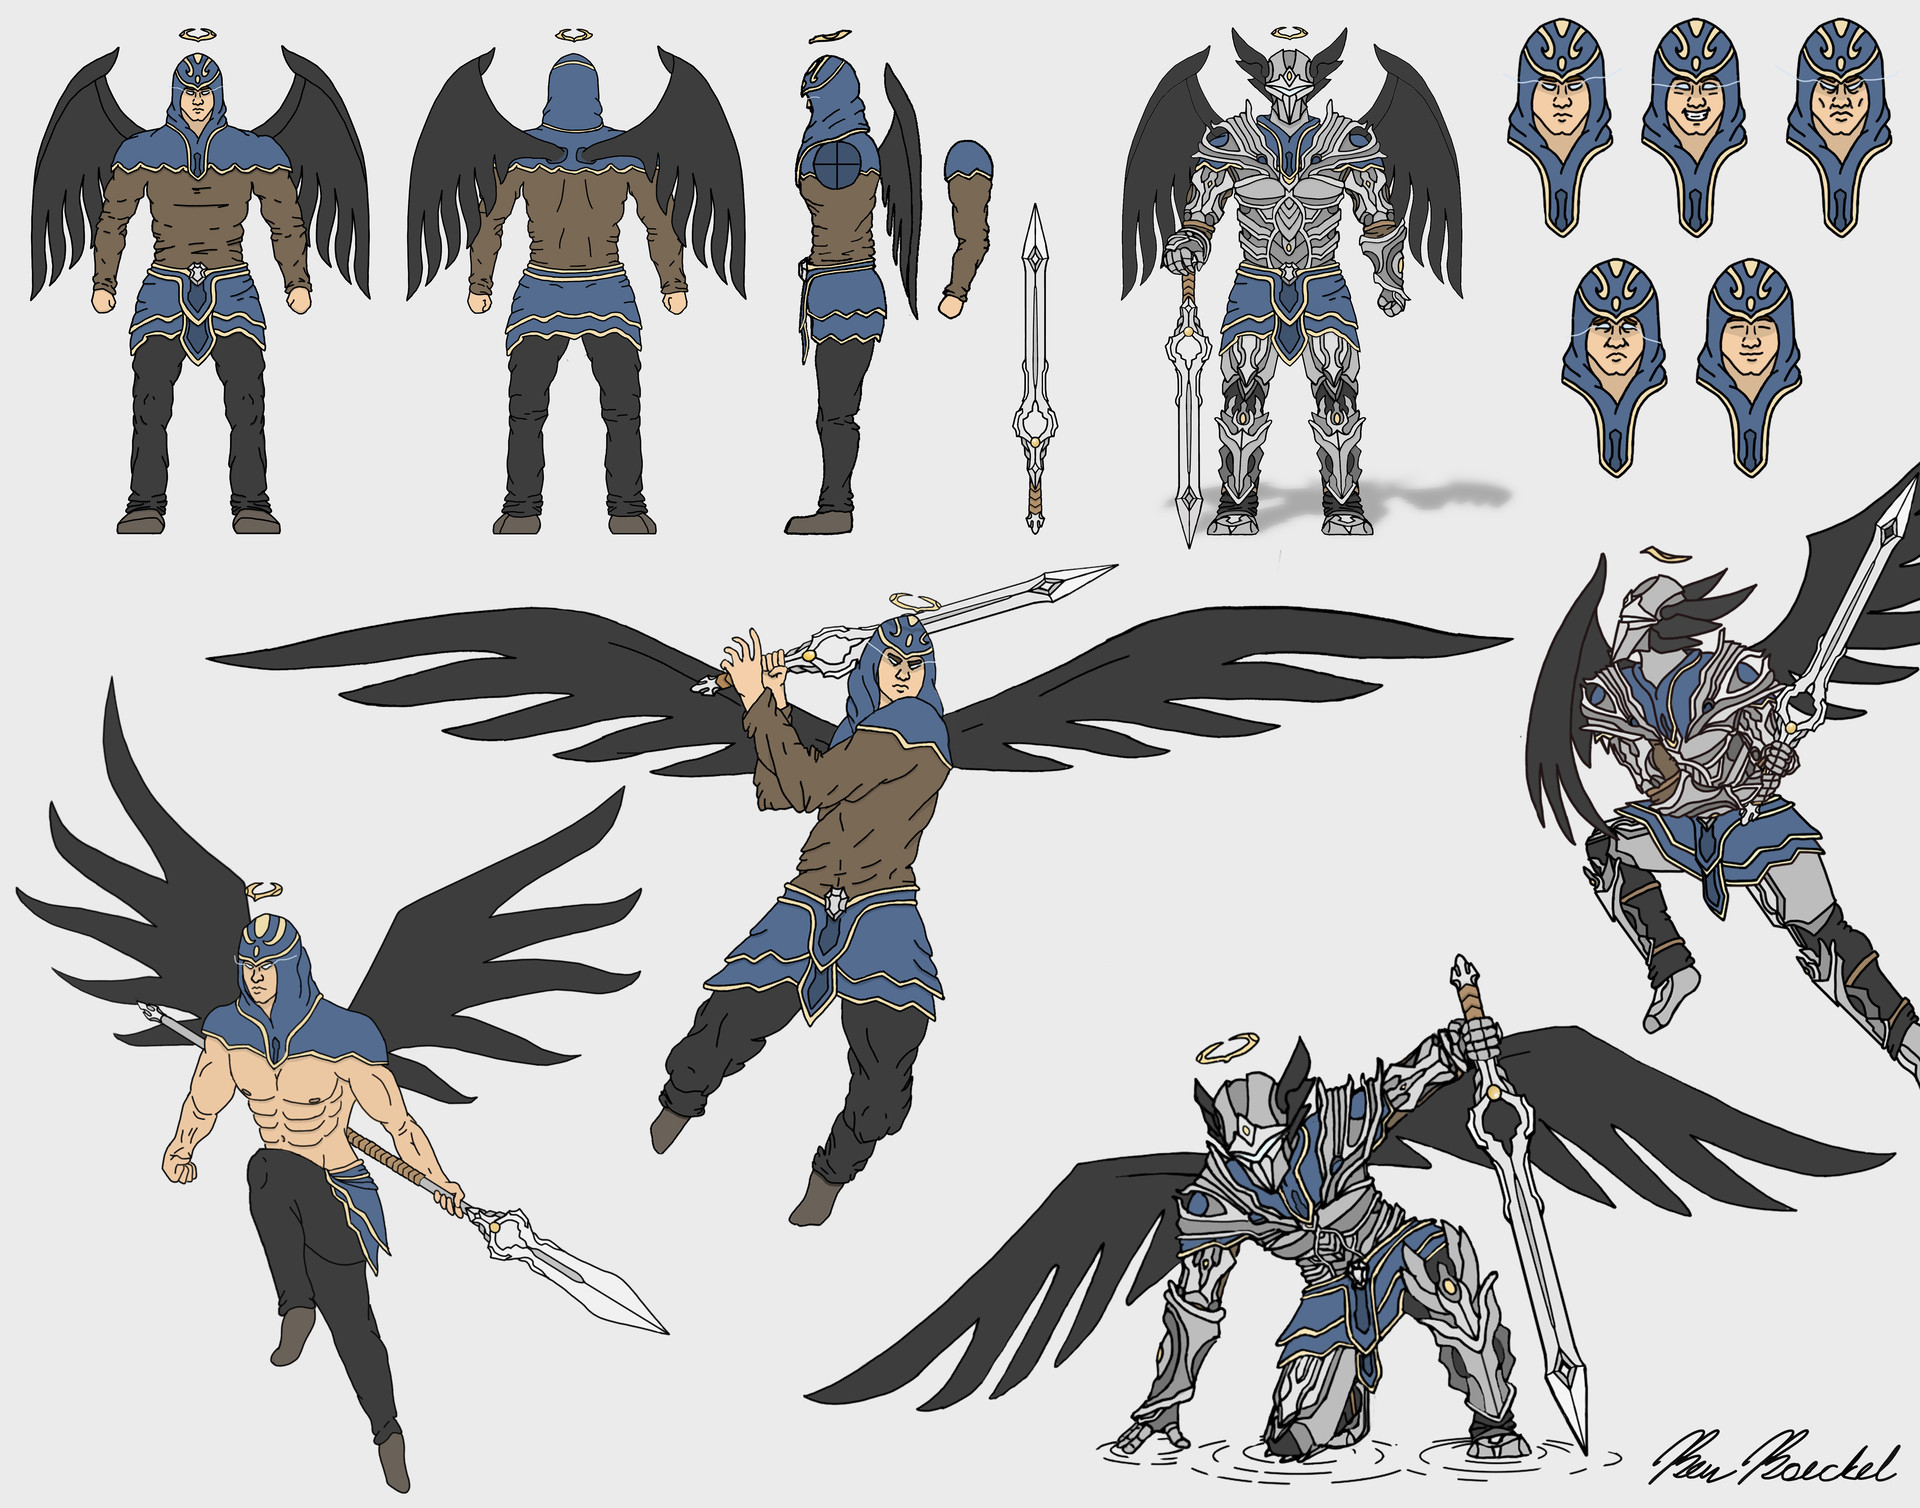 Ben Boeckel - Fallen Angel Addicus Character Sheet